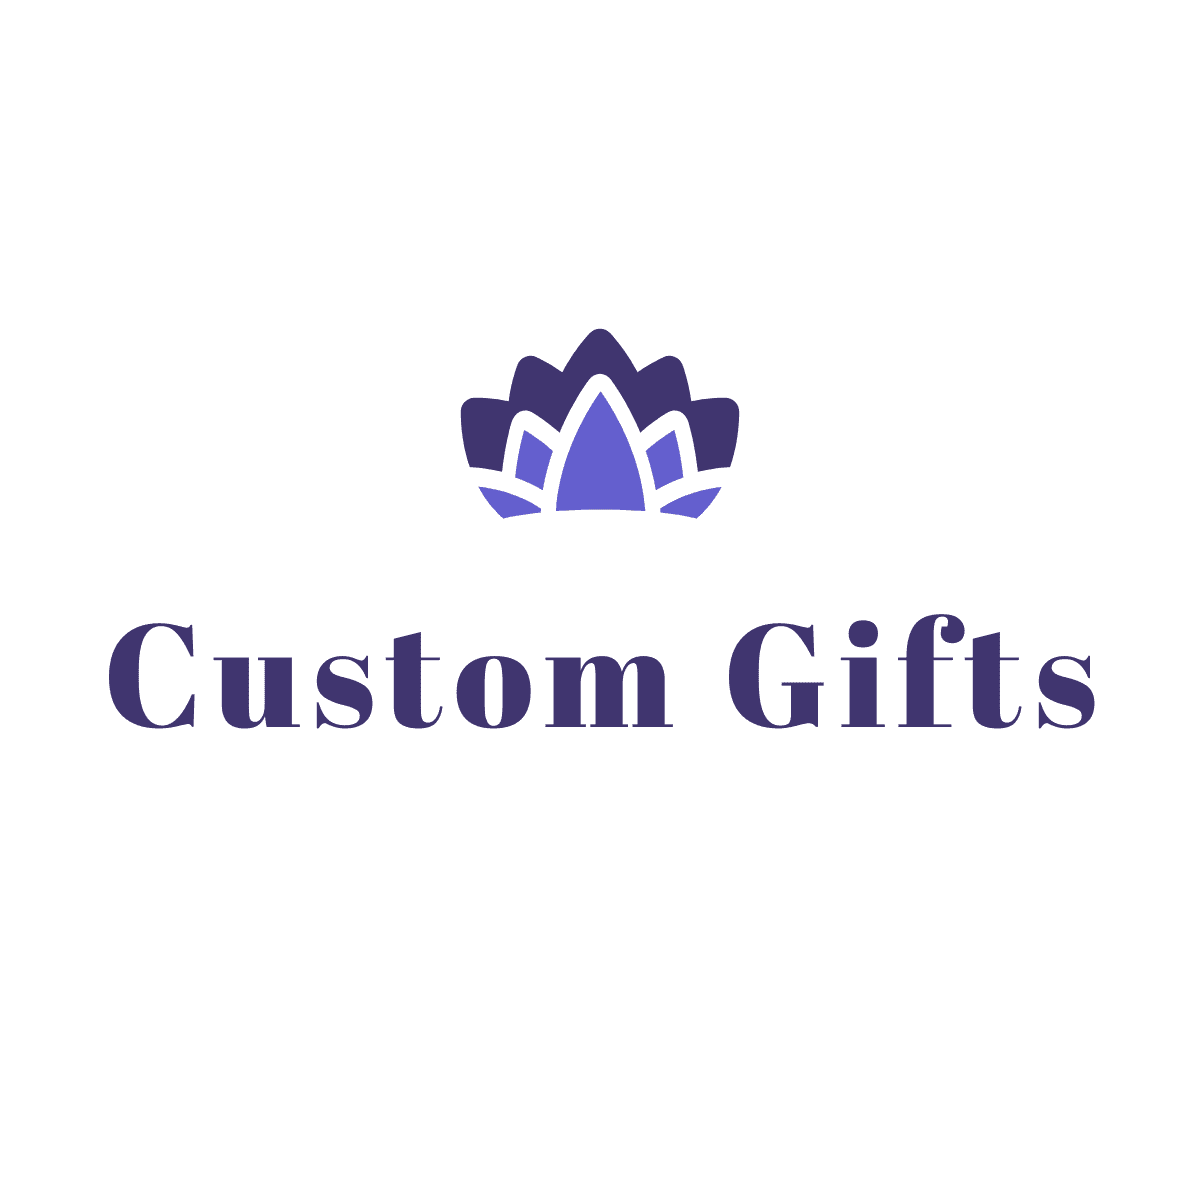 Customgifts